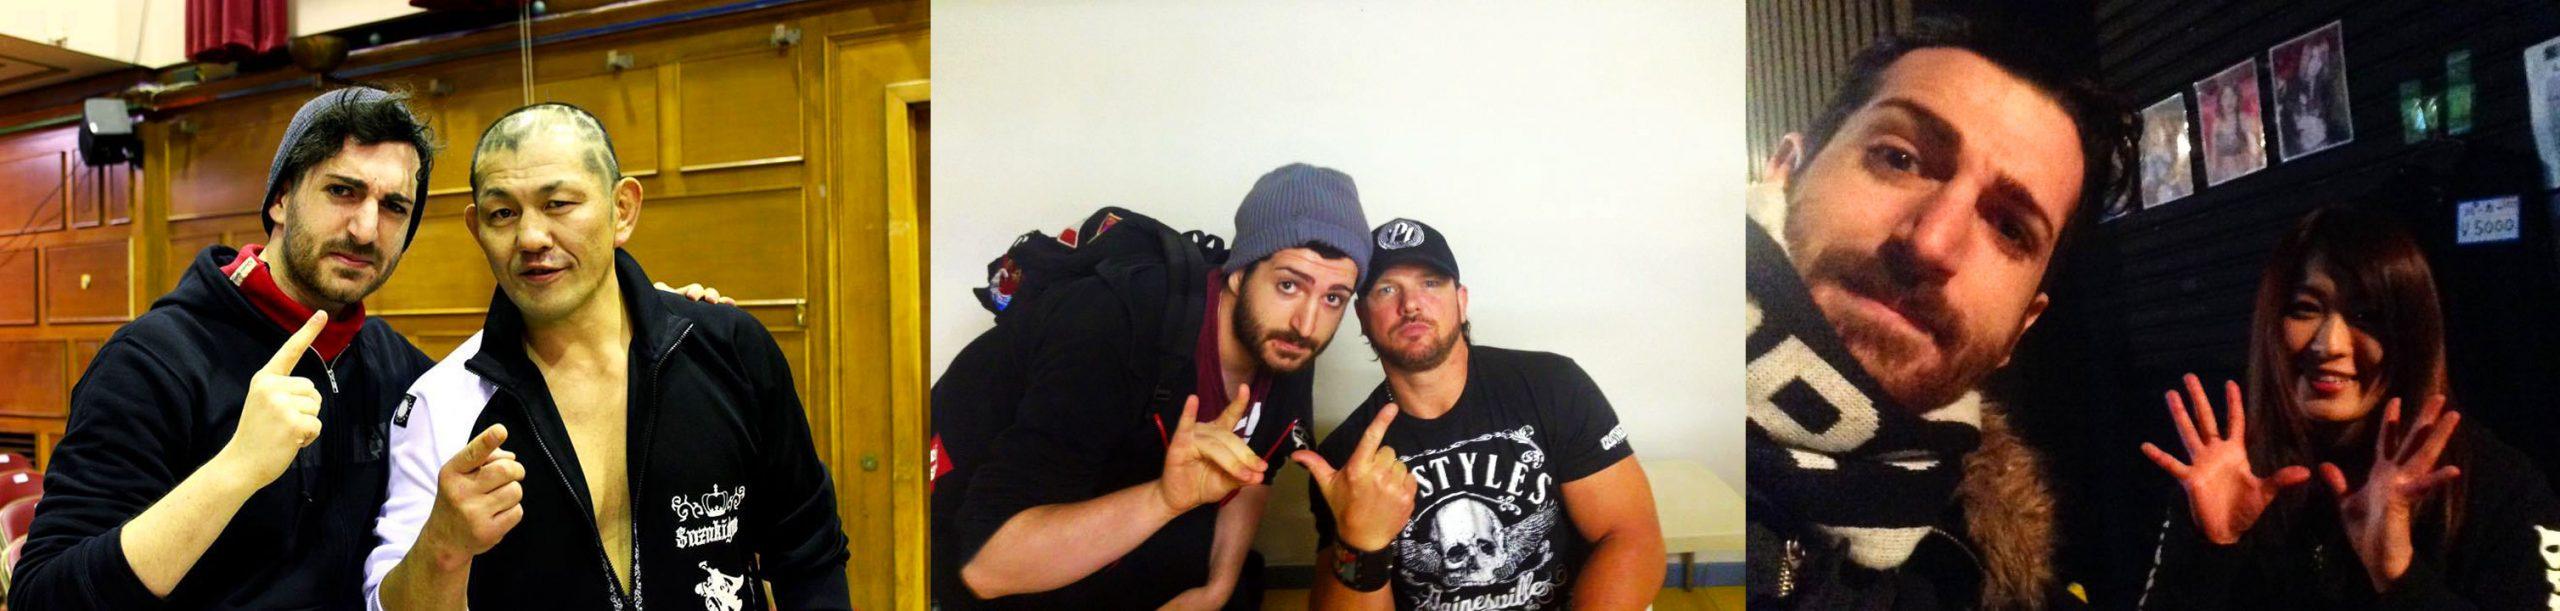 Ricordatevi di fotografarvi assieme ai vostri wrestler preferiti!